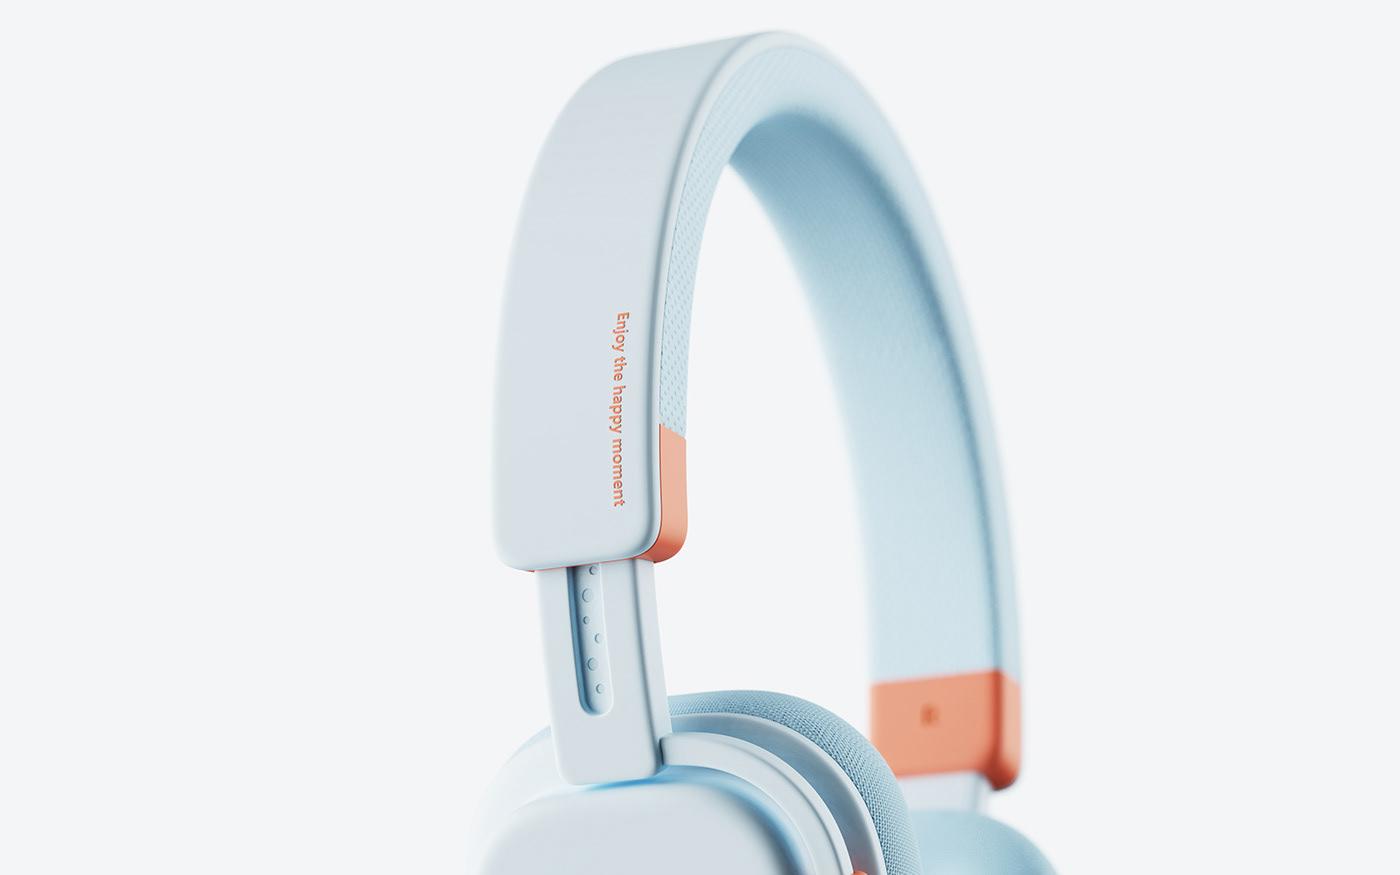 children industrial kids product product design  suosi headphones